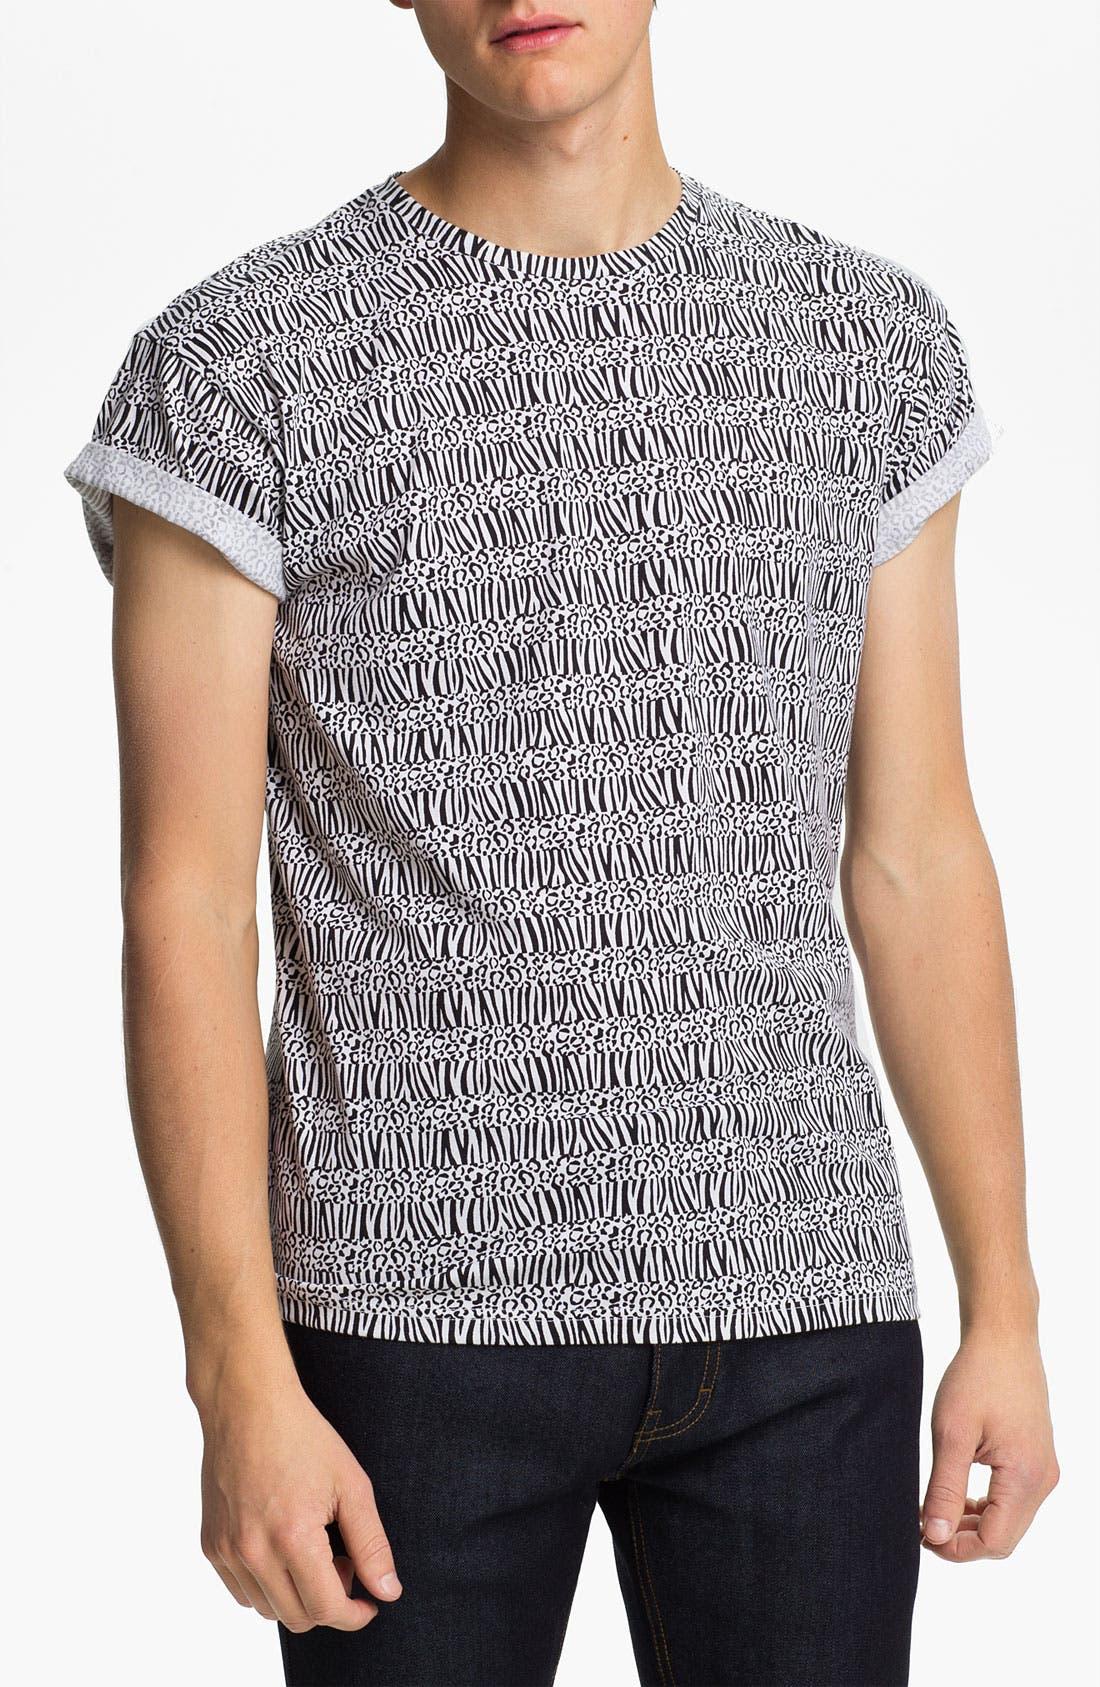 Alternate Image 1 Selected - Topman 'High Roller' All Over Animal Print T-Shirt